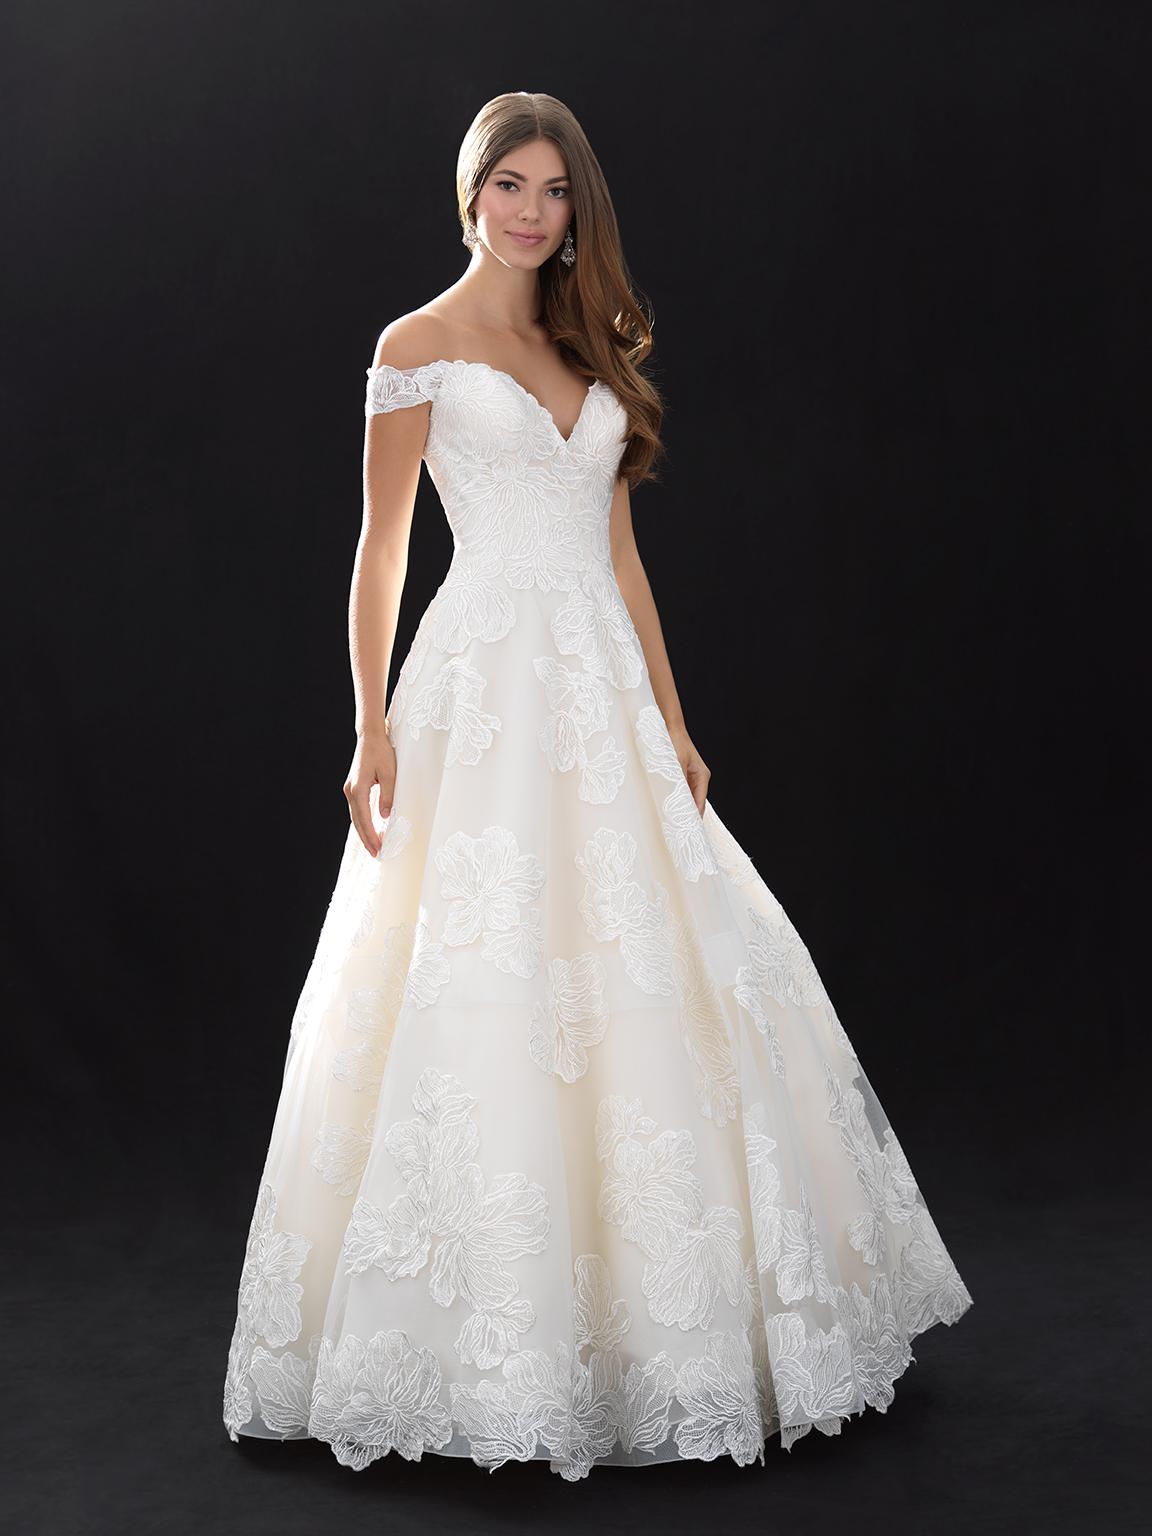 Classic Ball Gown Wedding Dress   Kleinfeld Bridal